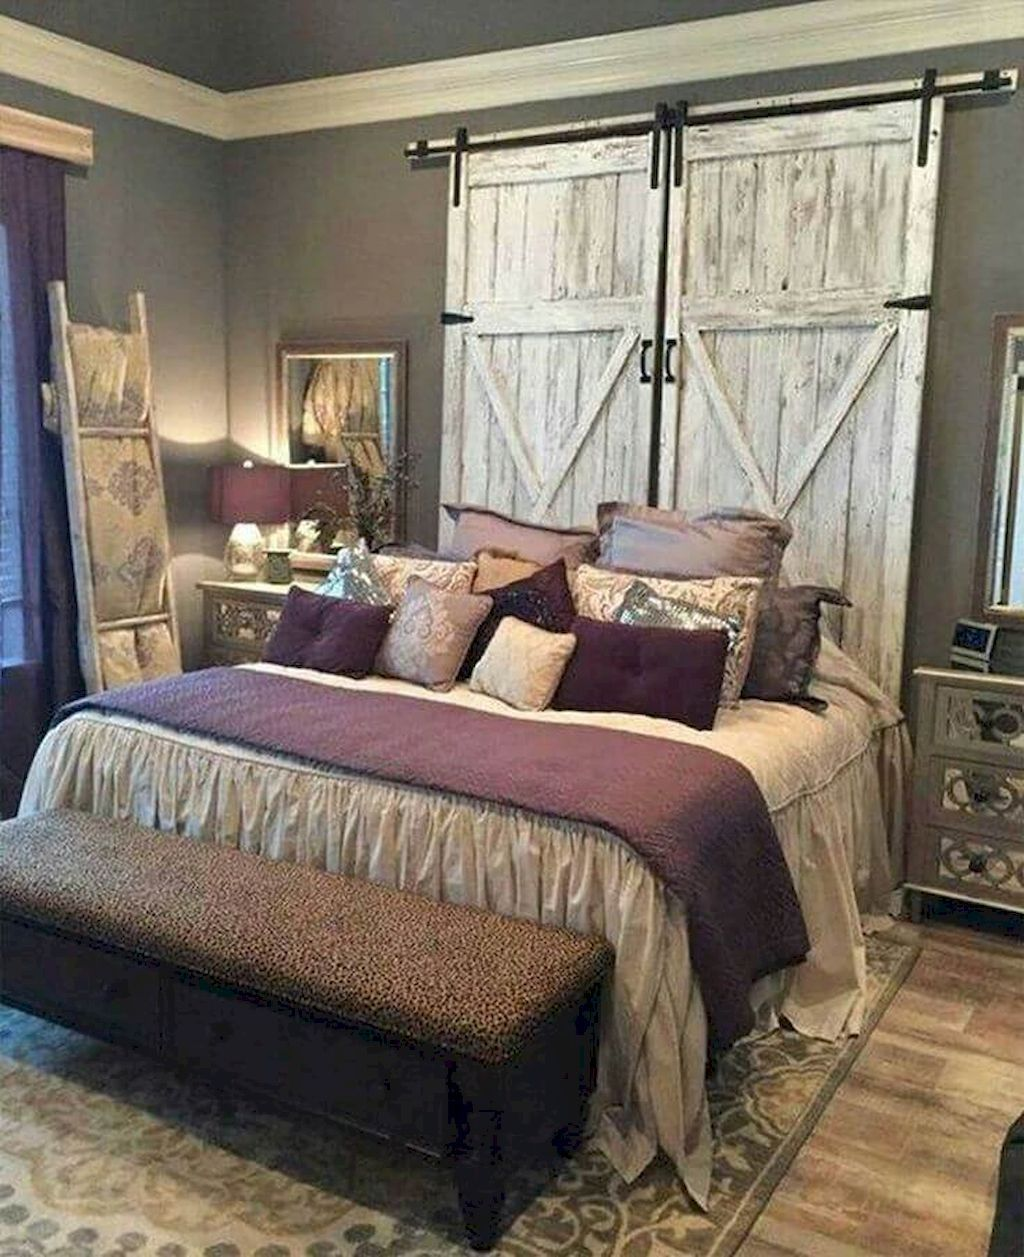 Master bedroom decorating ideas   Farmhouse Style Master Bedroom Decorating Ideas  Master bedroom